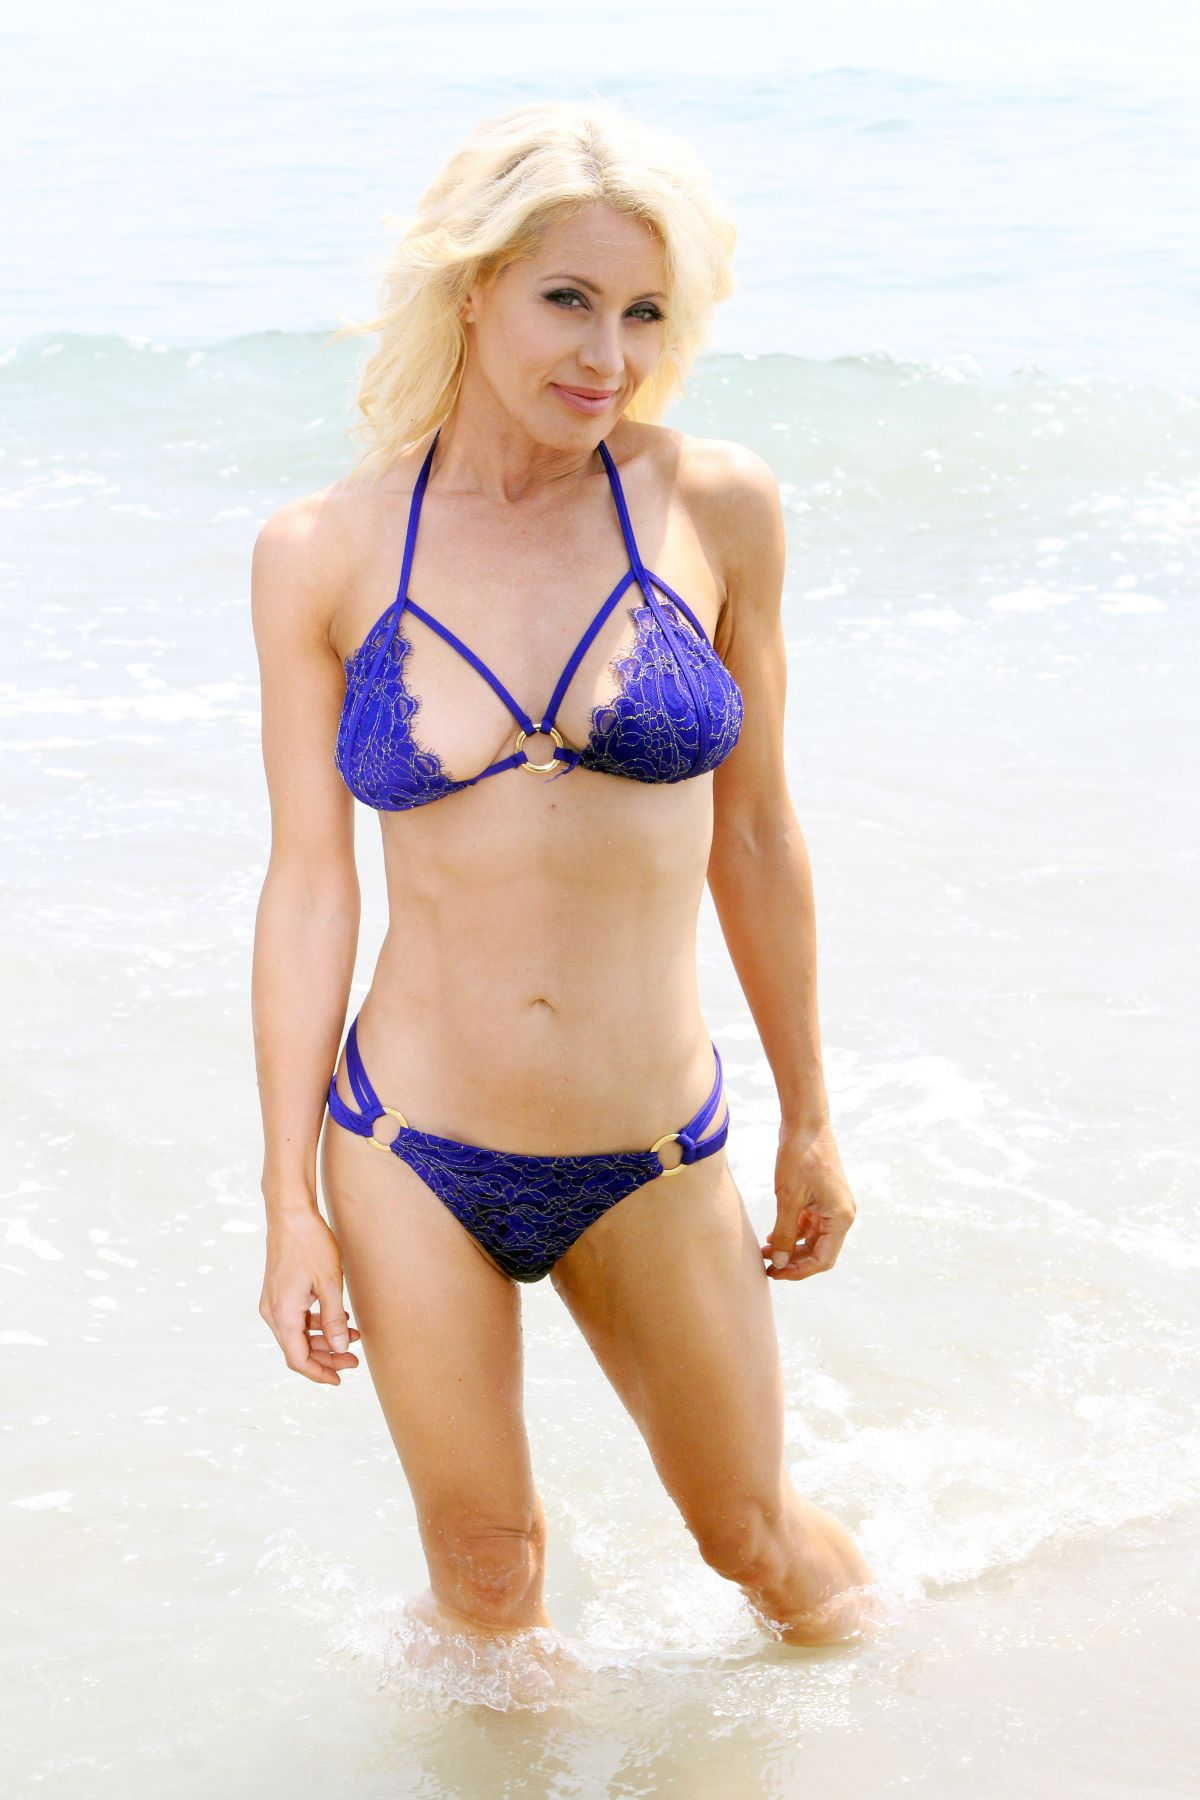 Bikini Sara Barrett naked (49 foto and video), Ass, Bikini, Boobs, underwear 2017